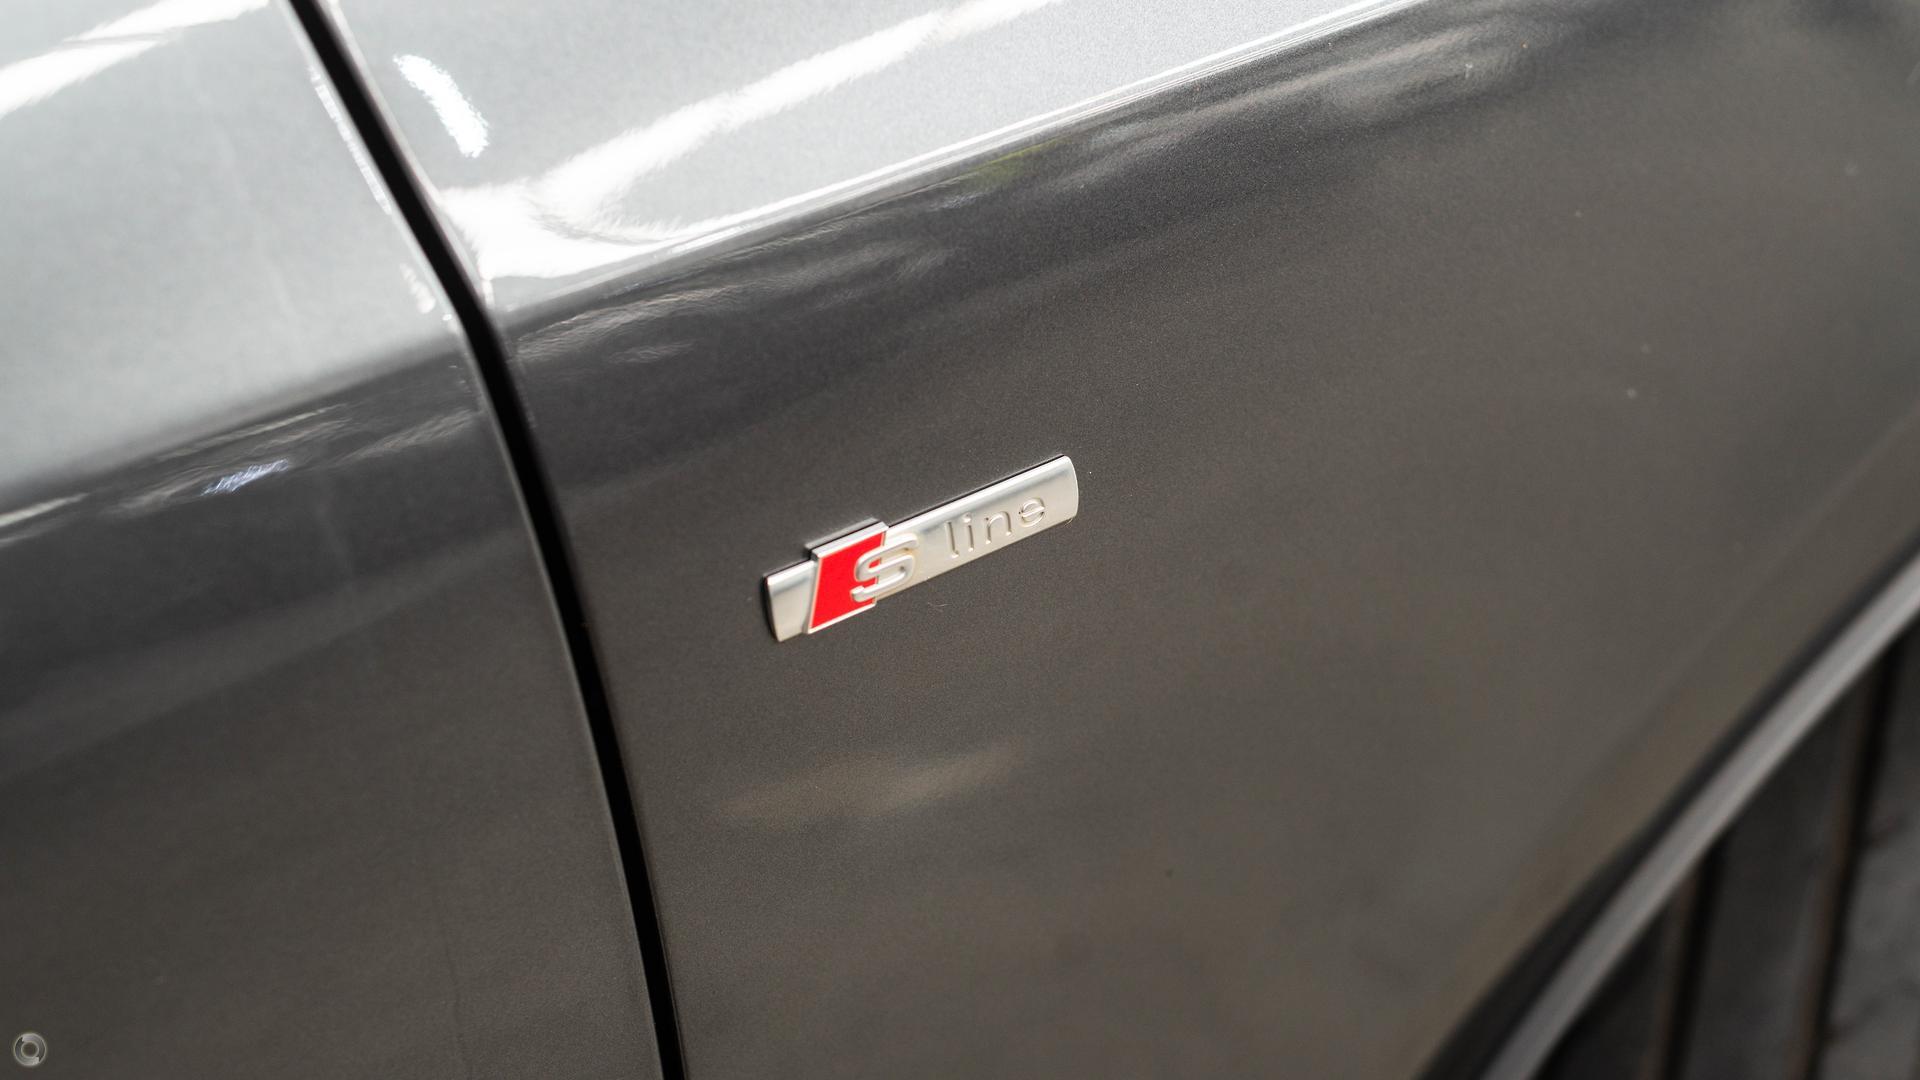 2015 Audi Q5 TFSI Sport Edition 8R